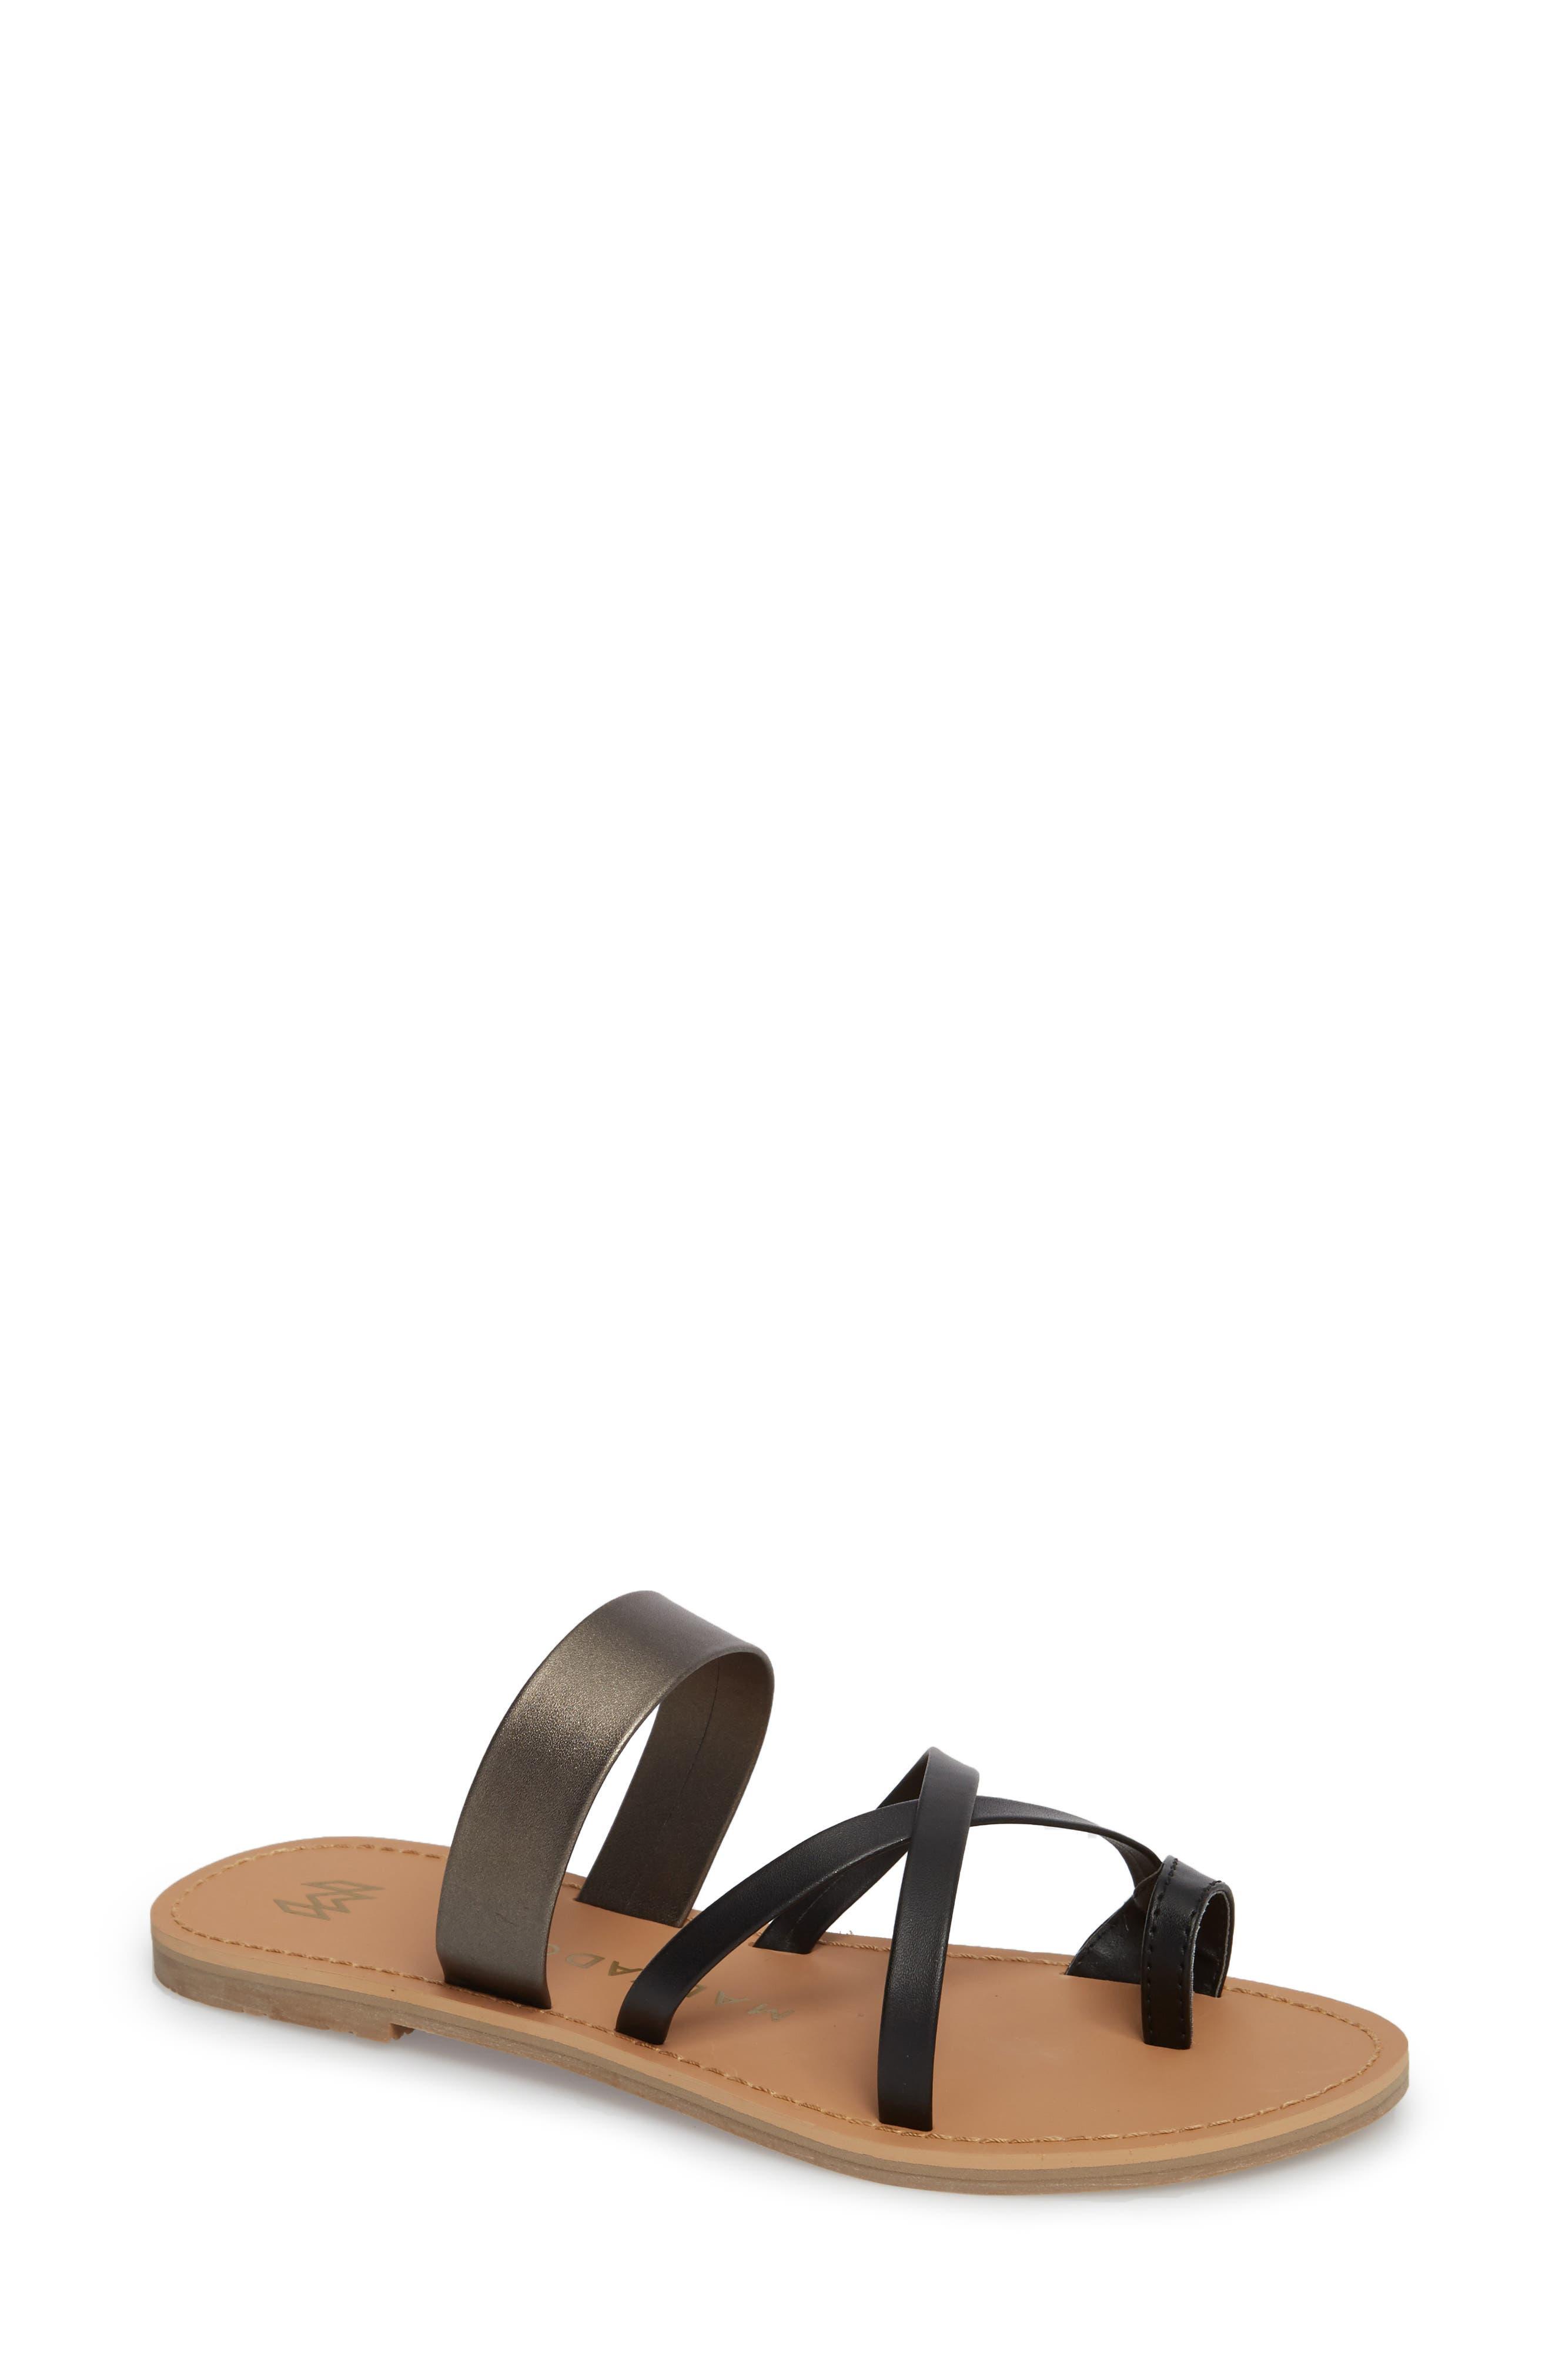 Icon Joni Slide Sandal,                         Main,                         color, 001